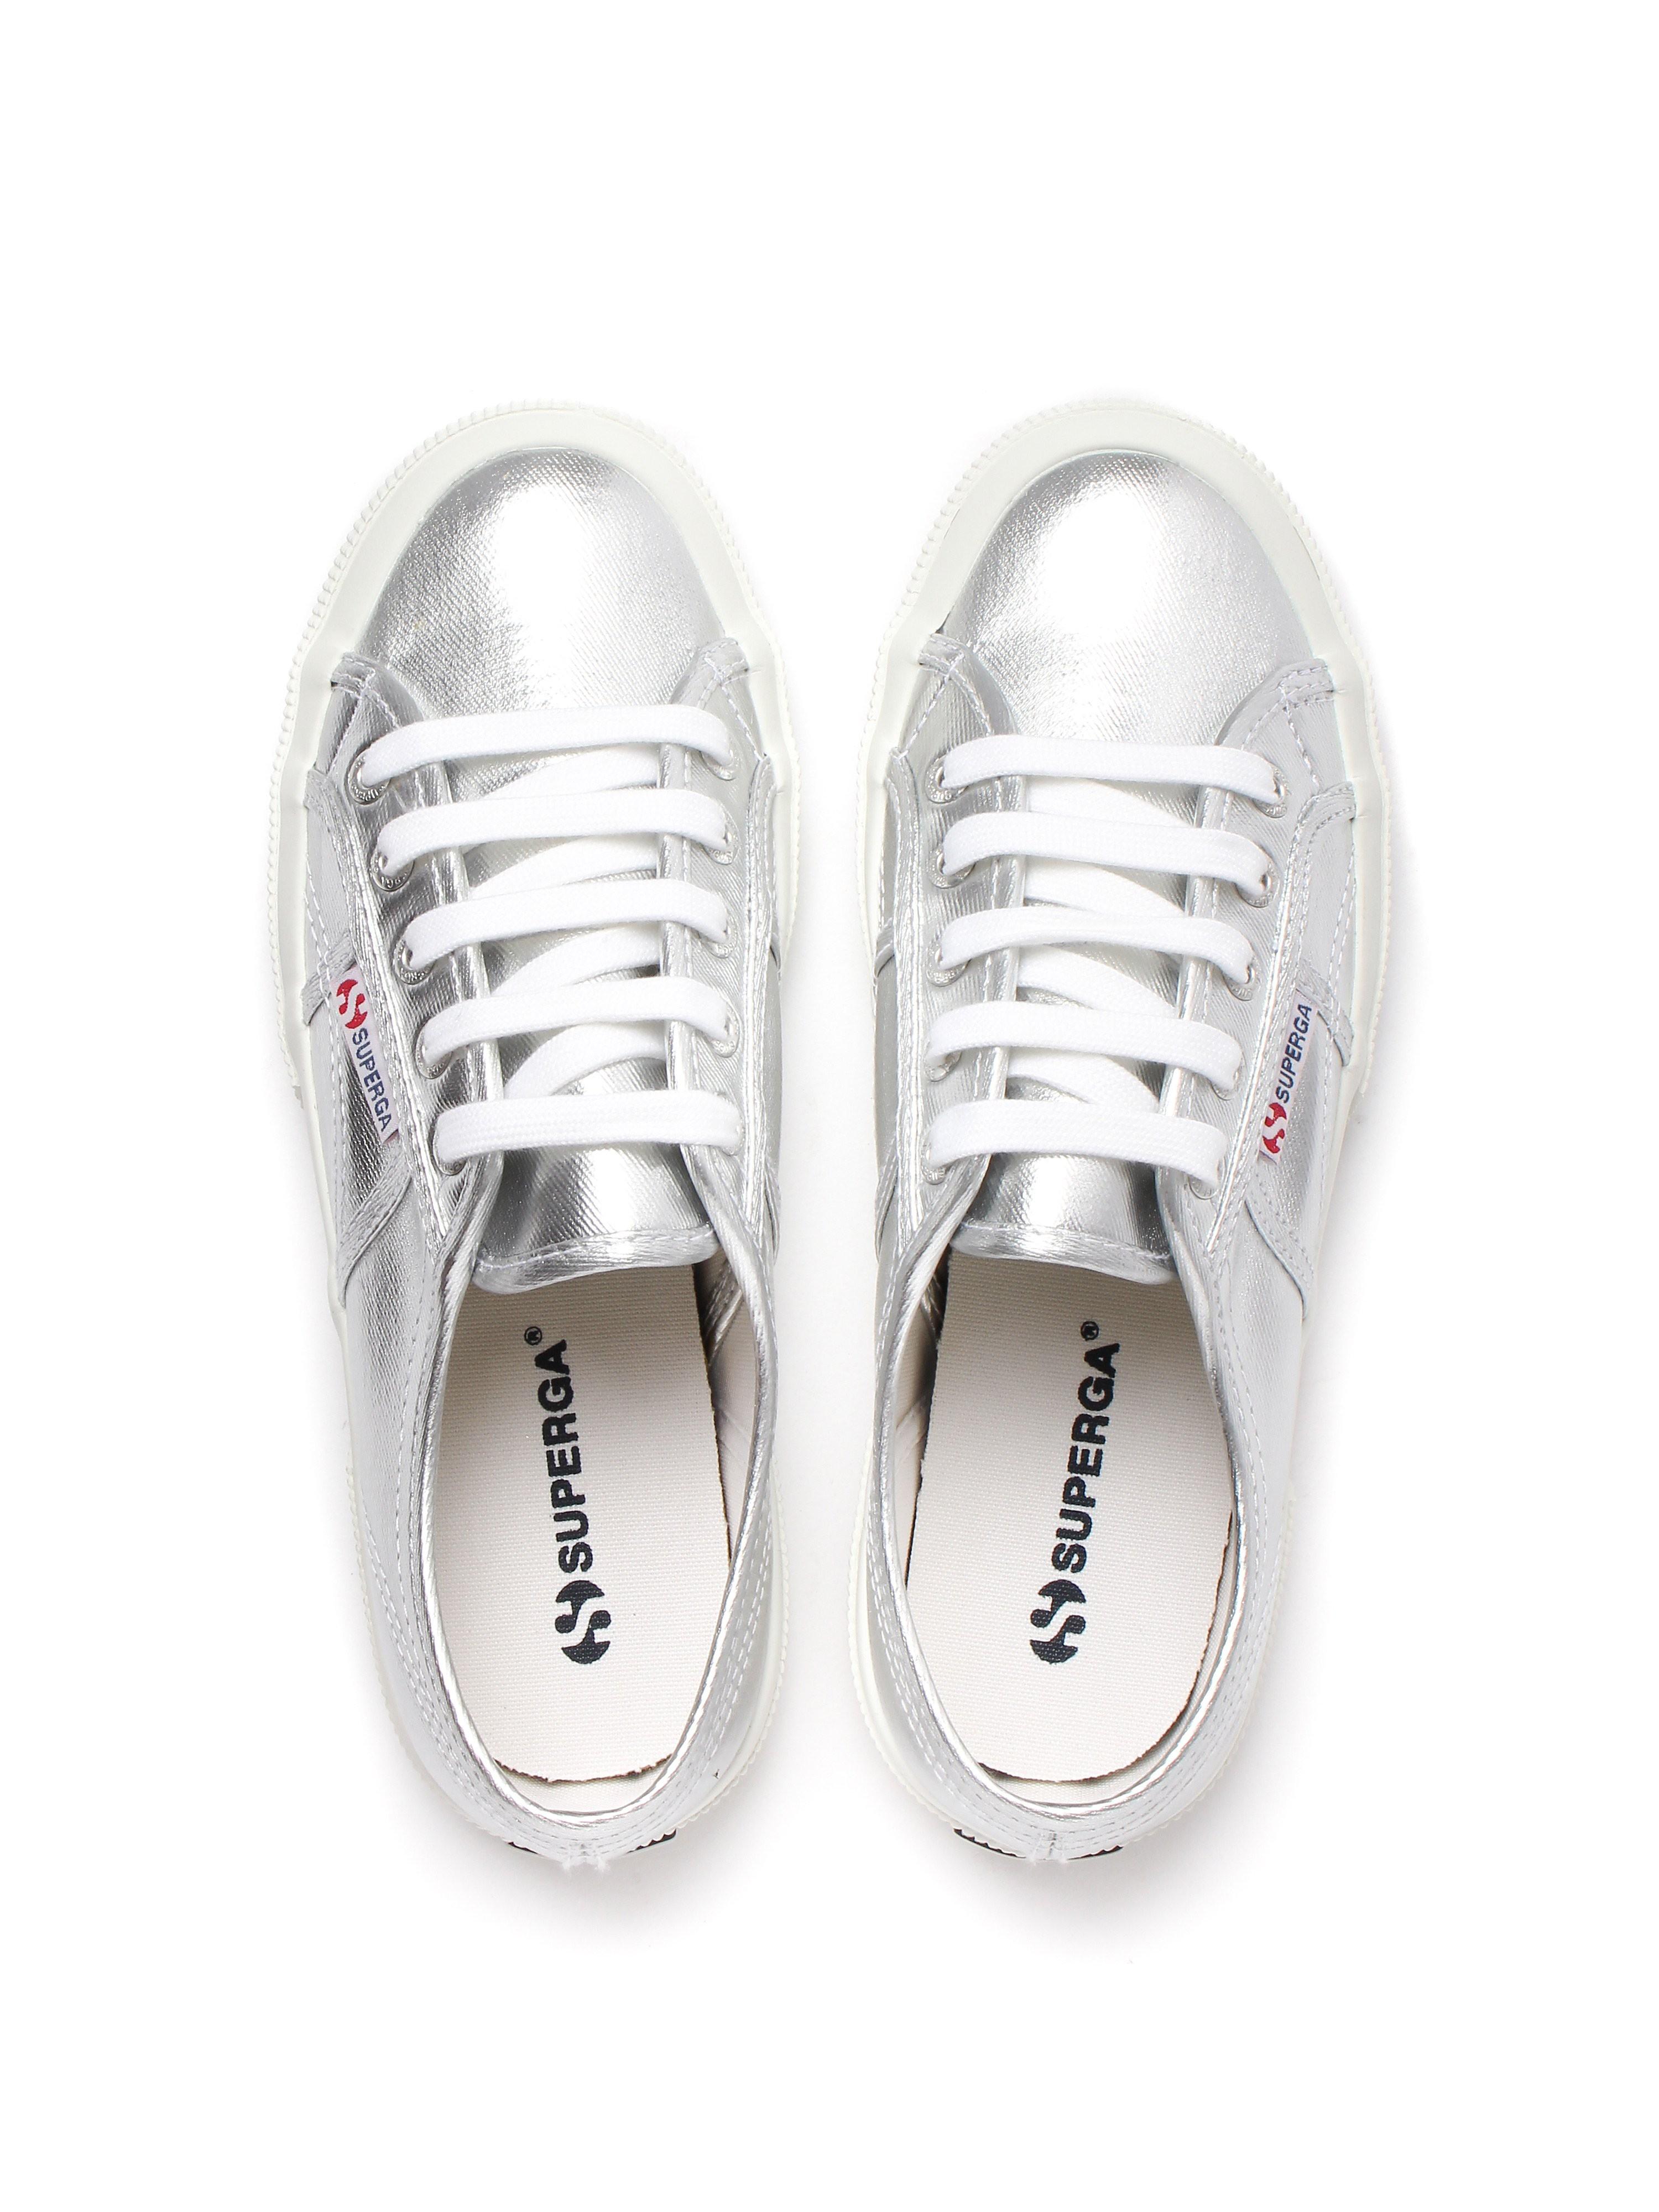 Superga Womens 2750 Metu Shoes - Silver